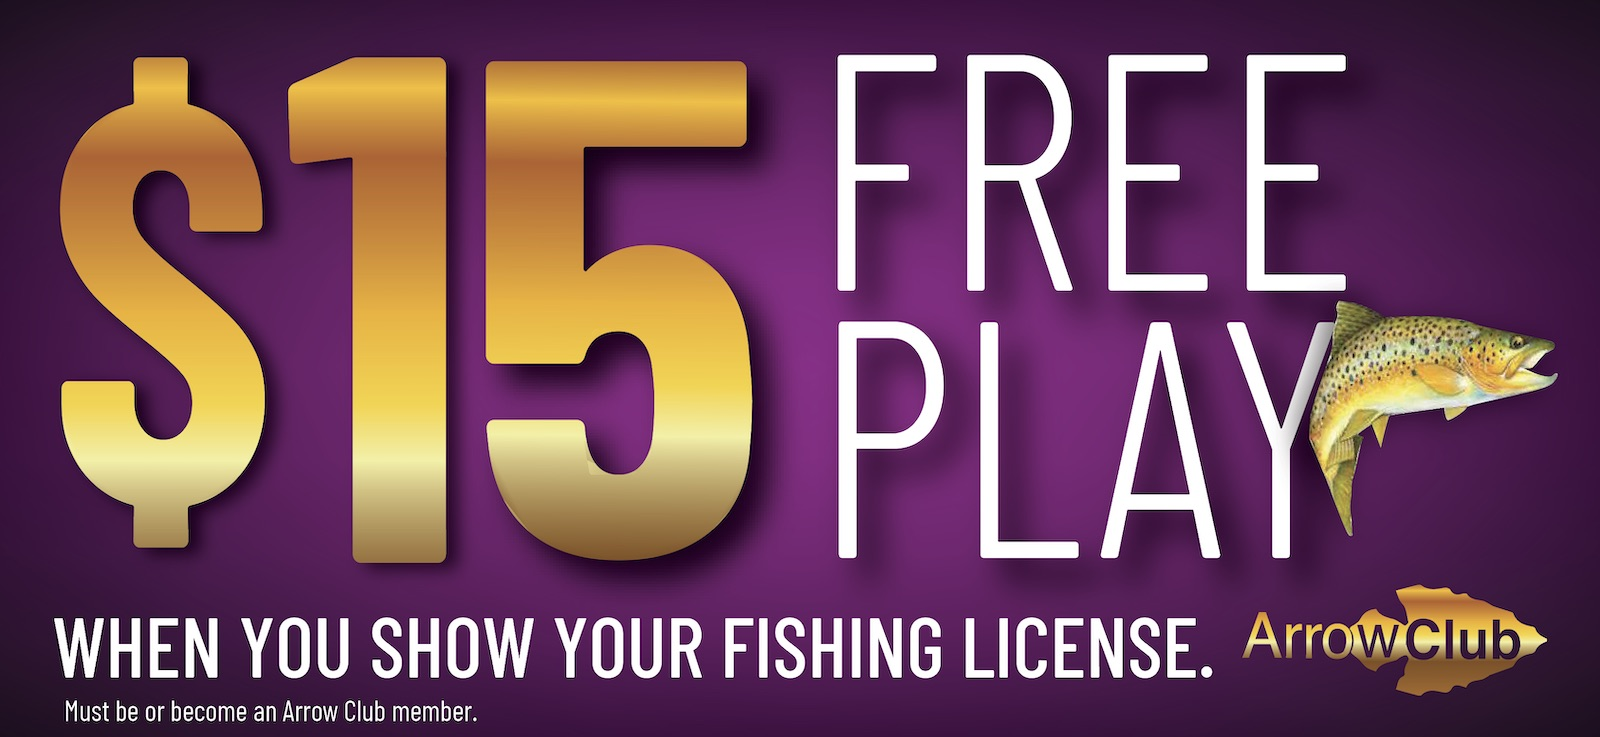 wanaaha casino fishing license free play